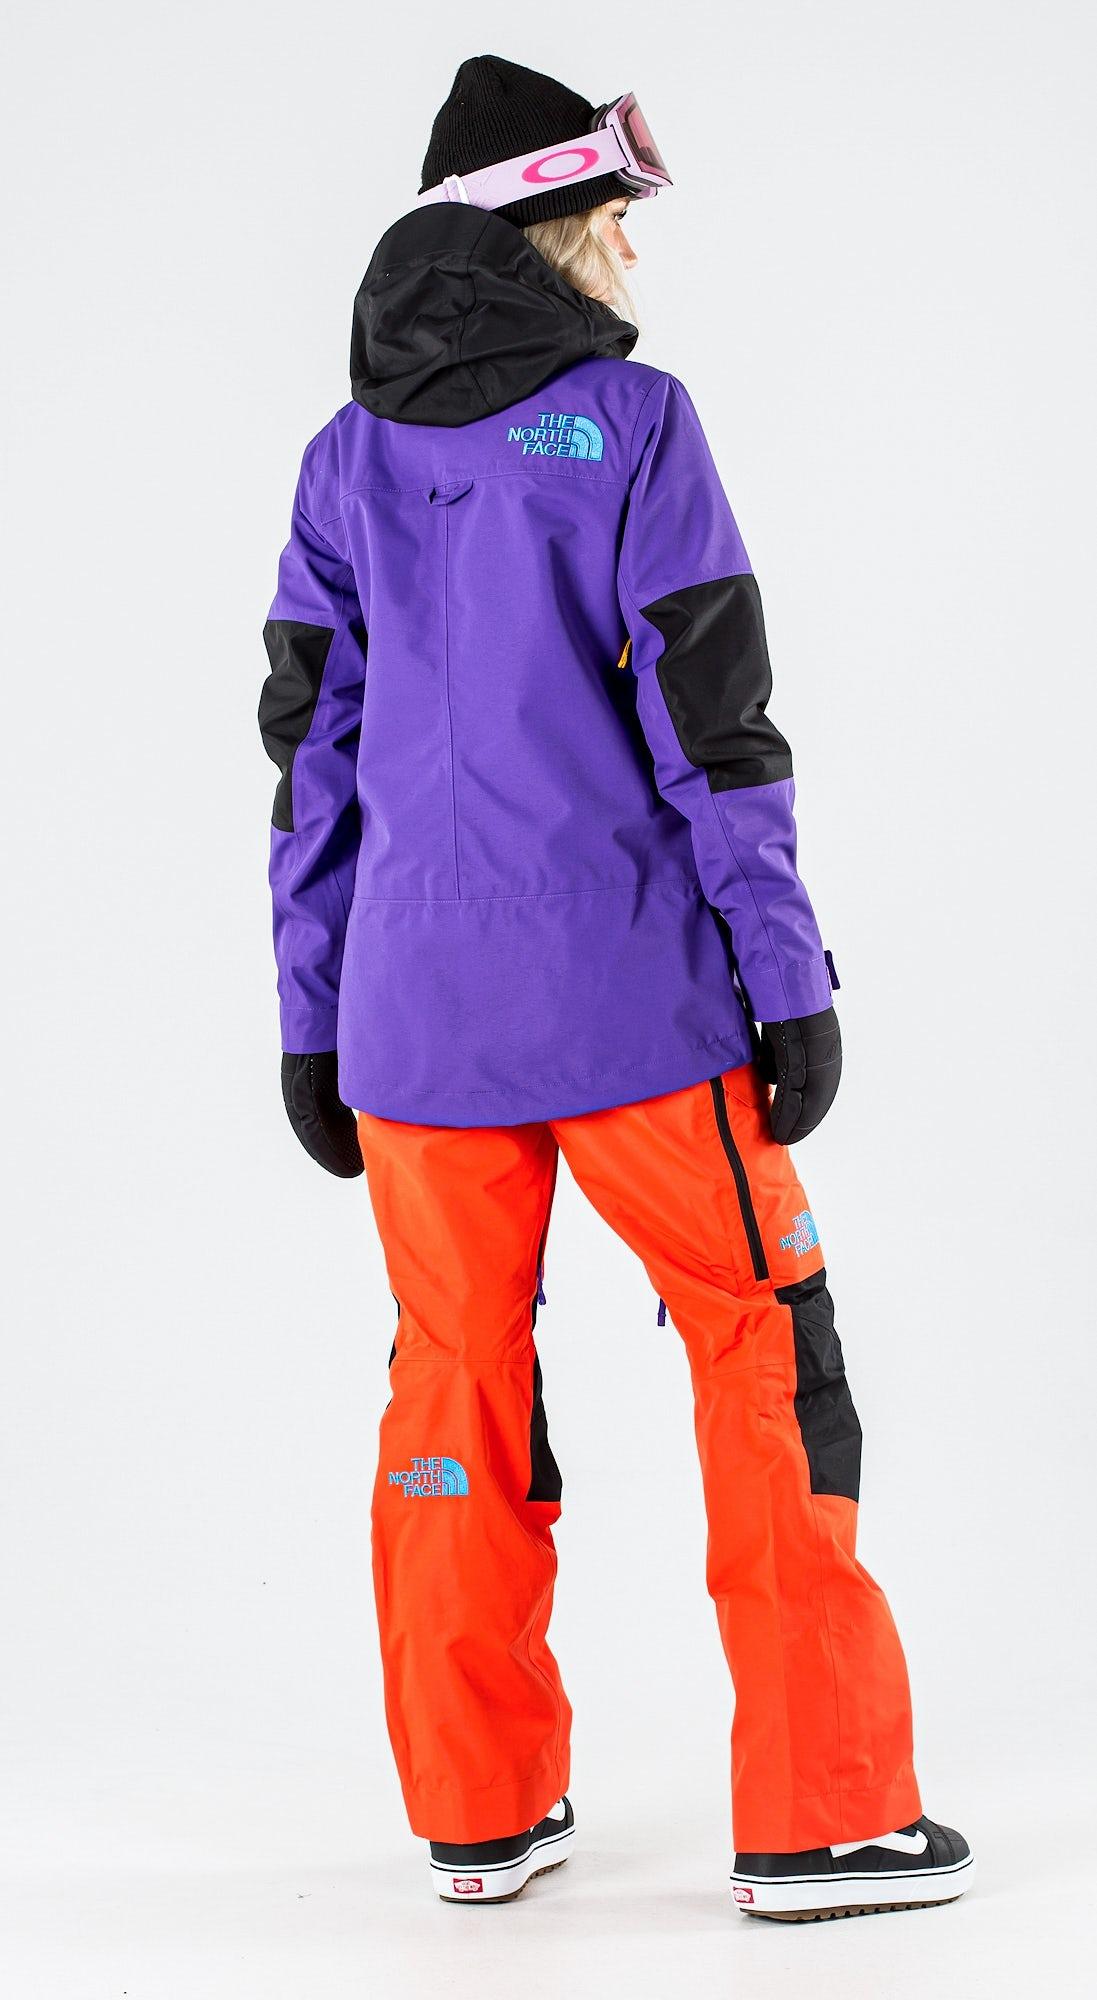 The North Face Team Kit Peak Purple/Flare/Tnf Blk